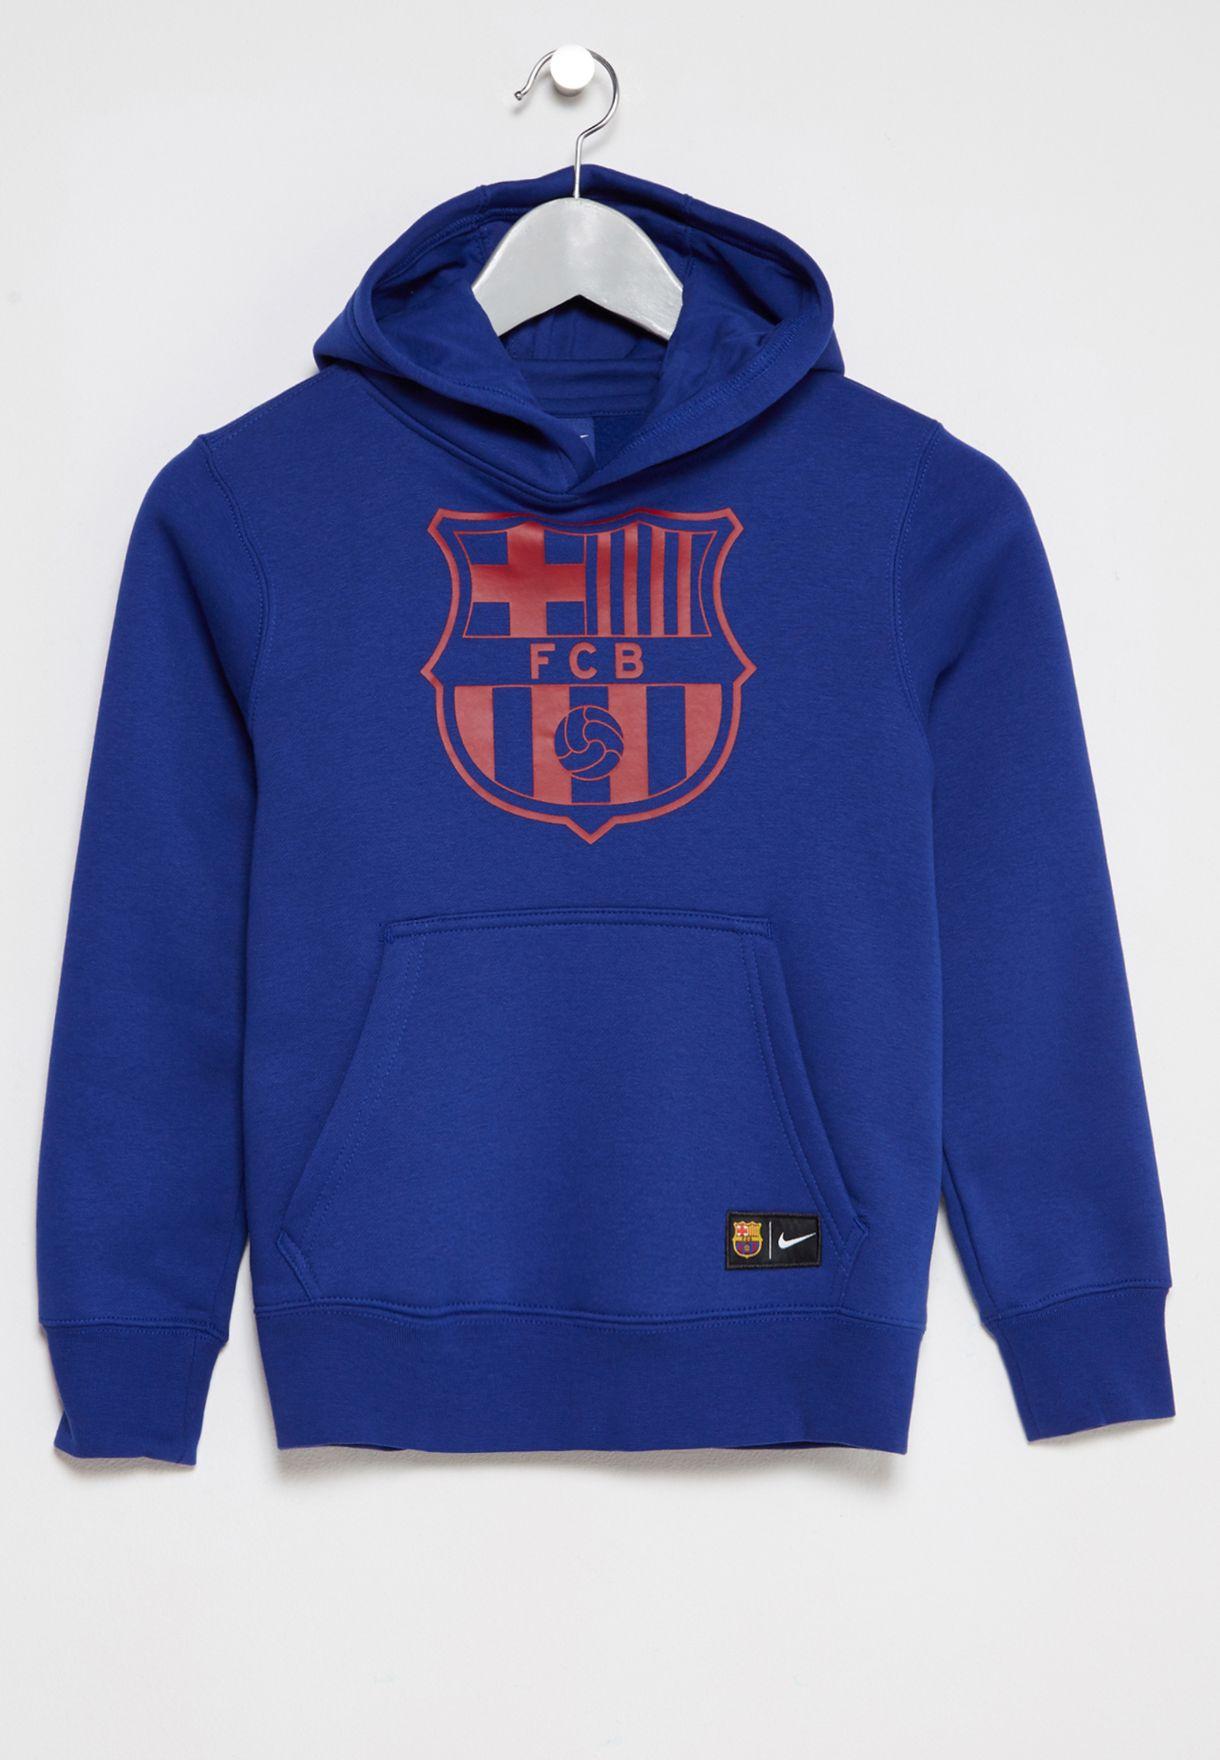 b1cd330fc68 Shop Nike blue Youth FC Barcelona Hoodie 886662-455 for Kids in UAE ...